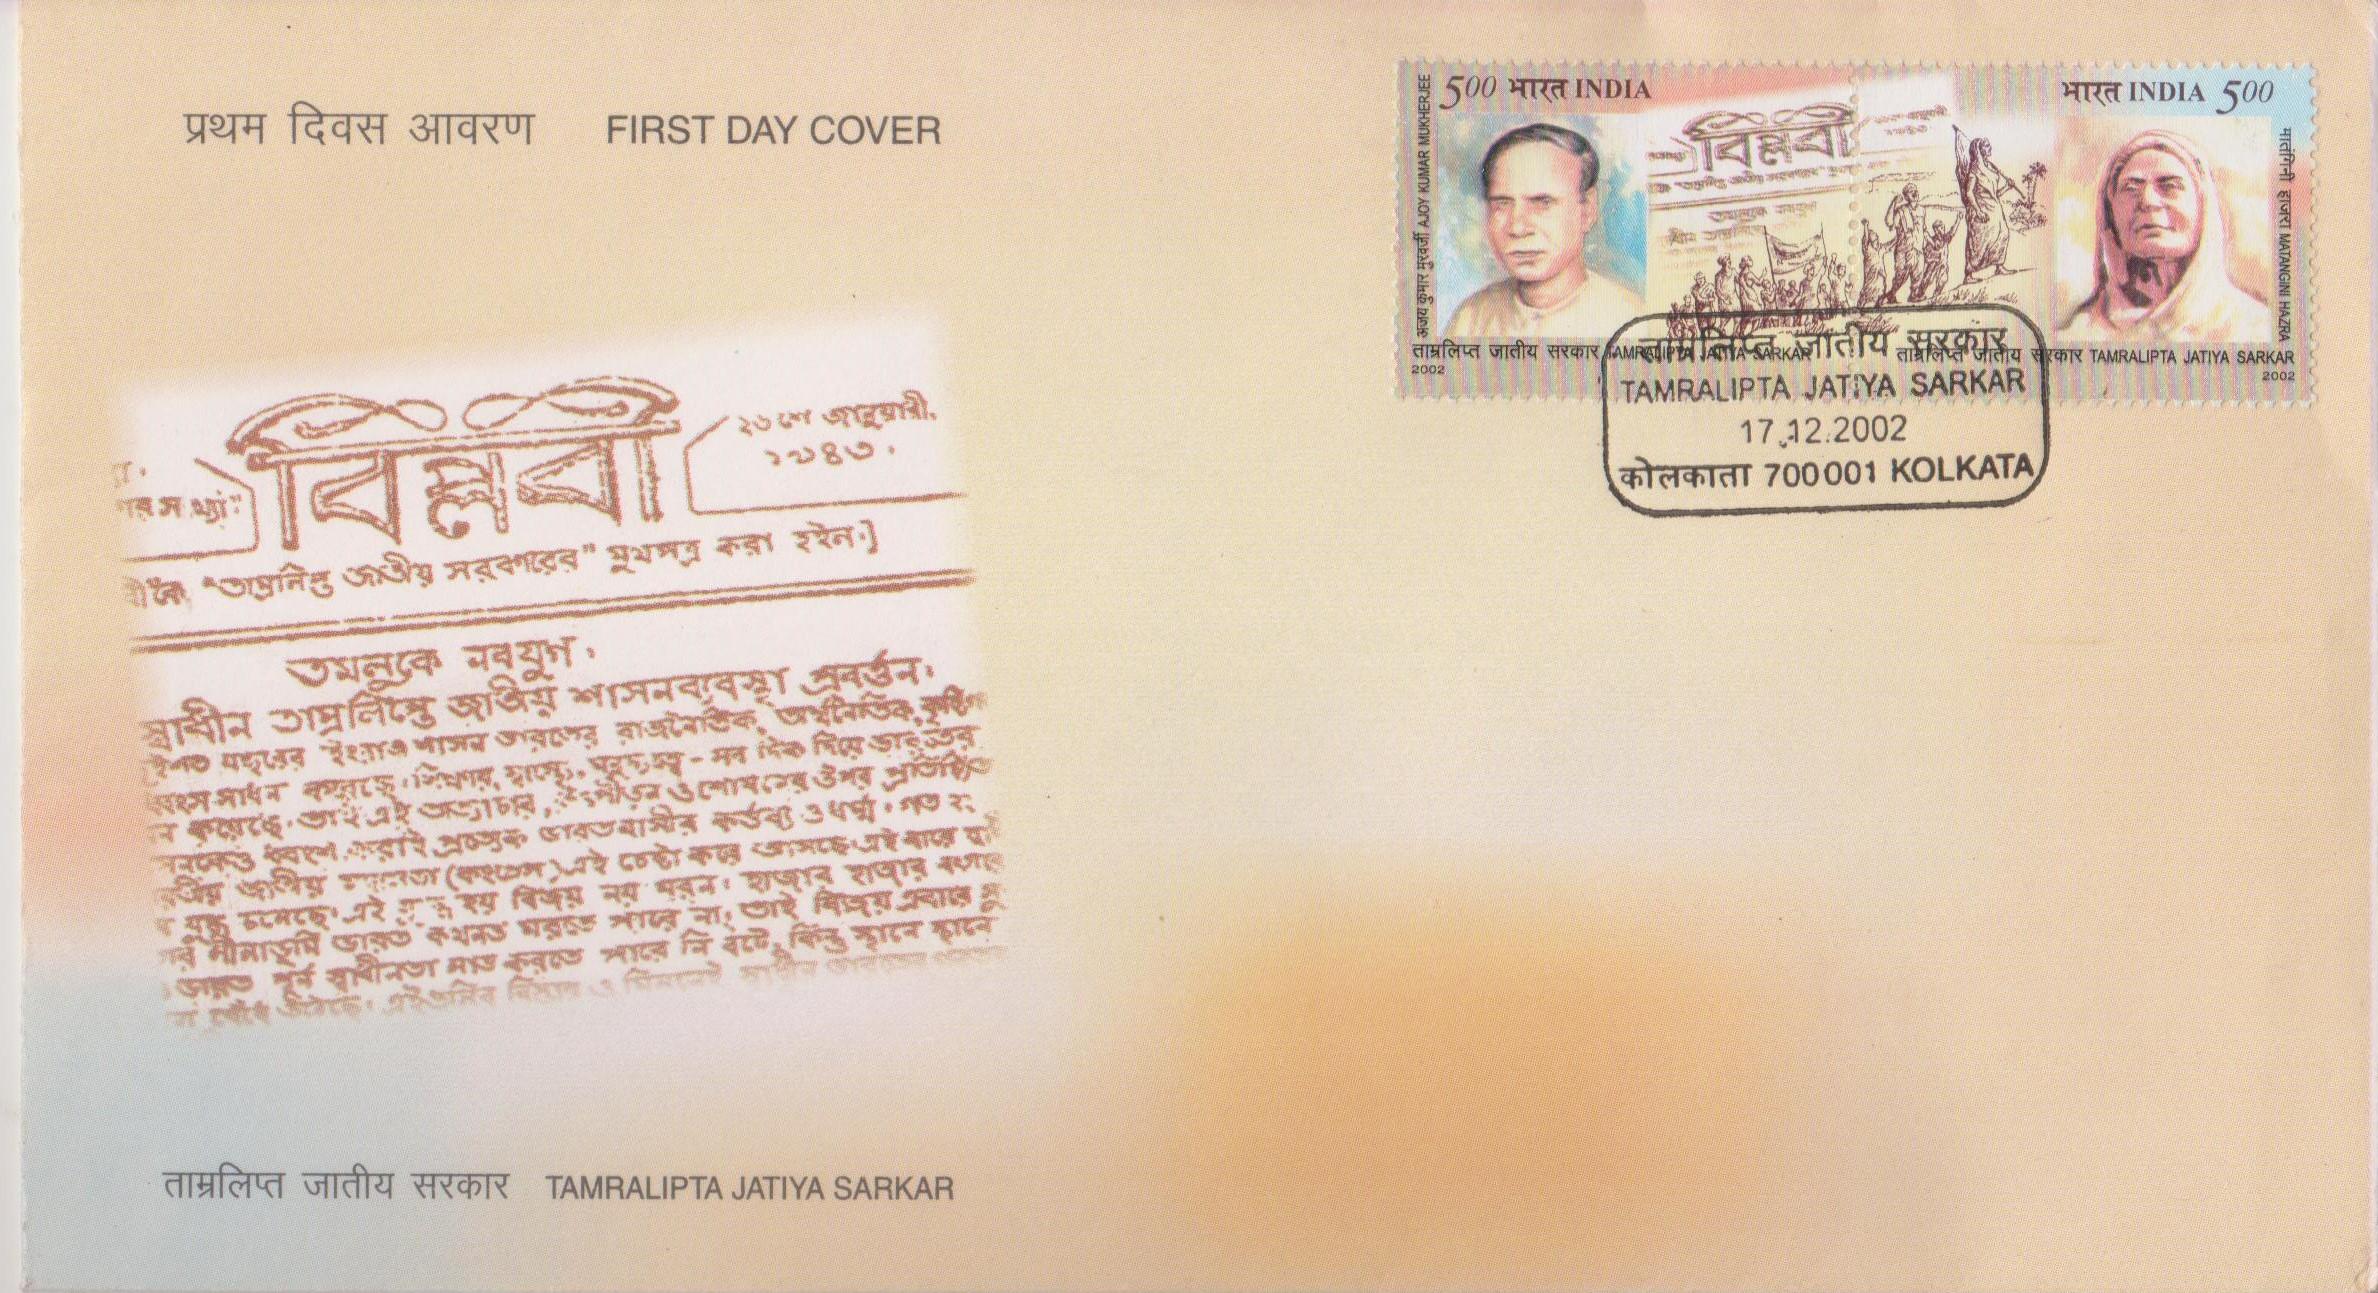 Tamluk Jatiya Sarkar, Midnapore